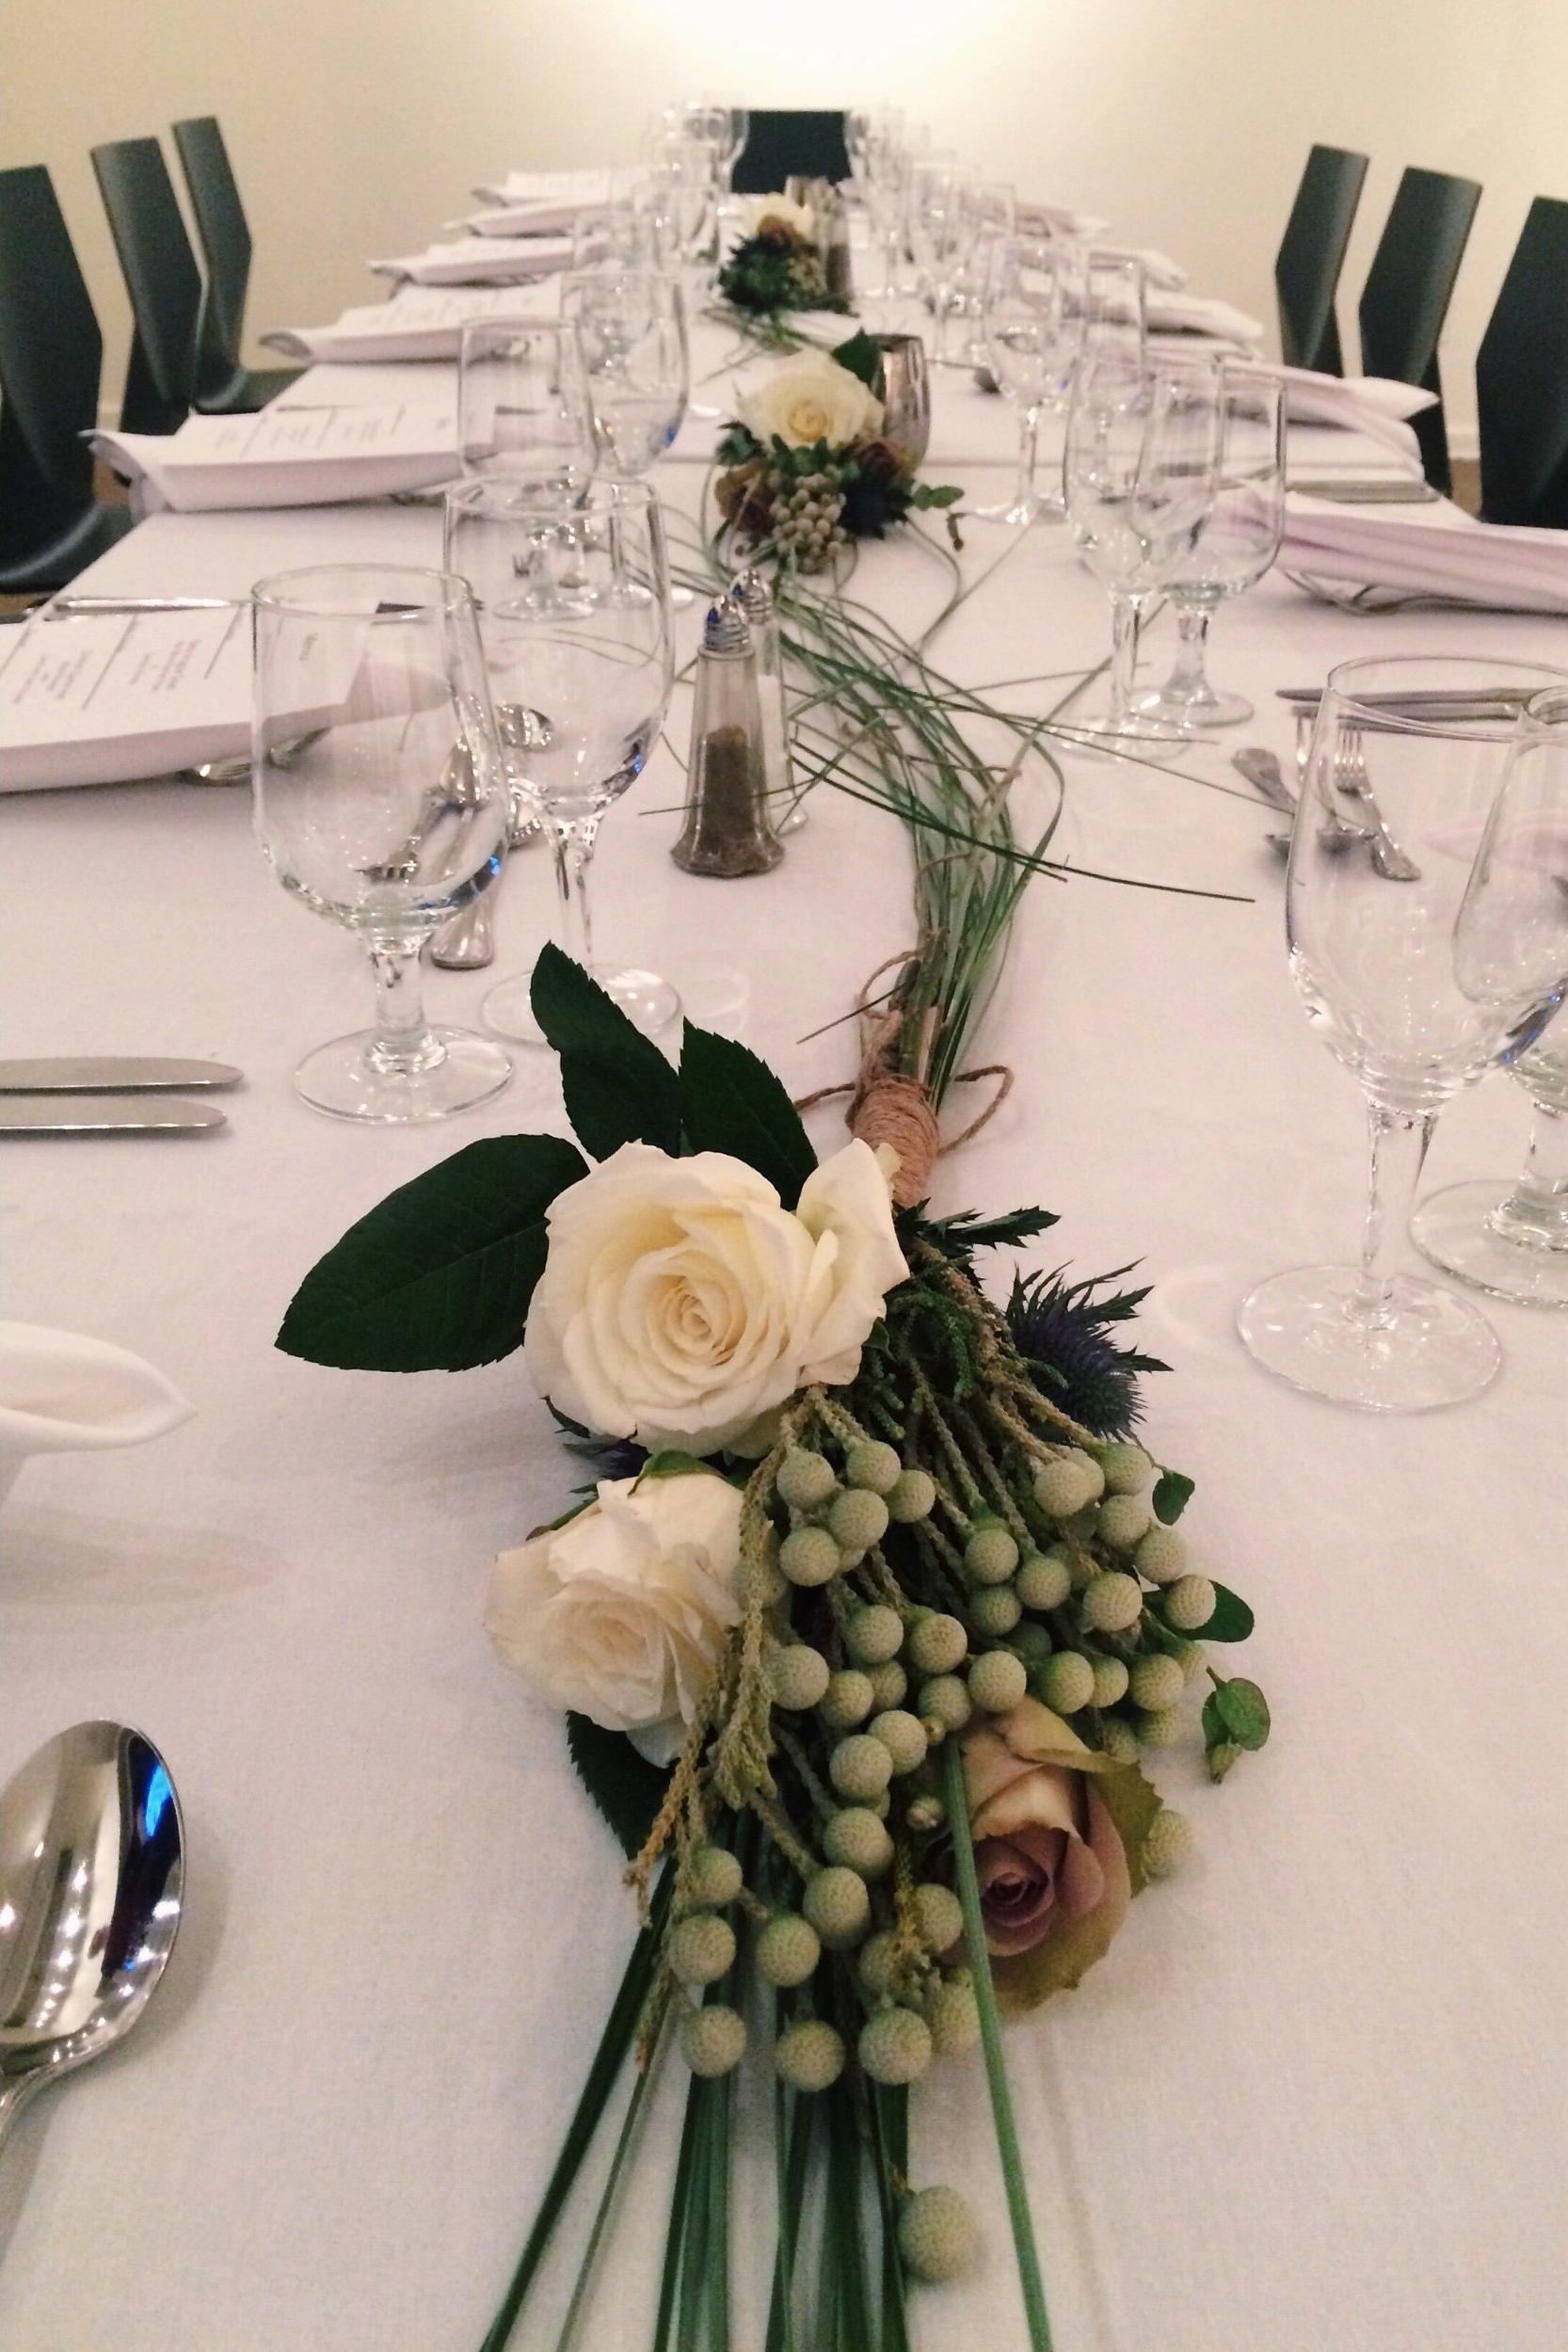 Wedding Coordination, Non-profit + Sponsored events, Production management.